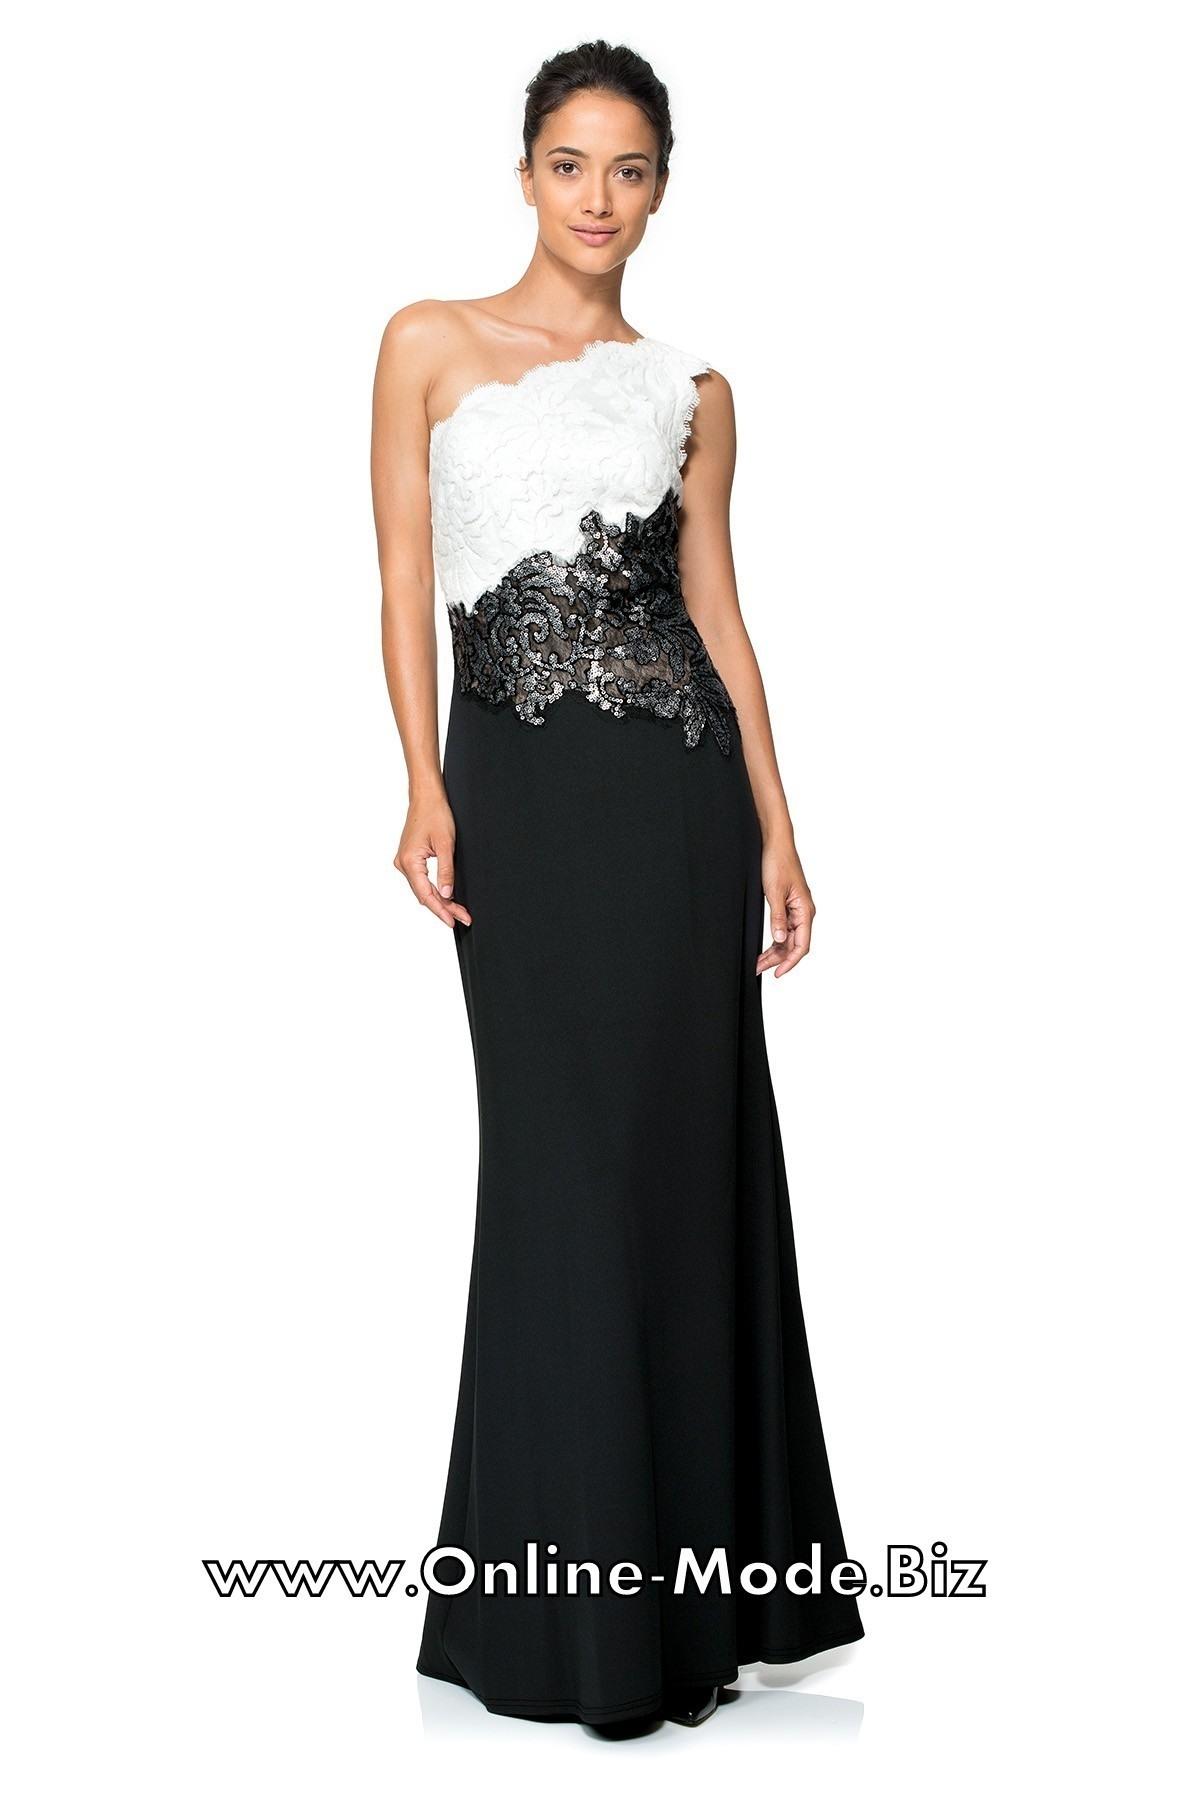 Abend Genial Abendkleid Schwarz Weiß Lang Boutique10 Elegant Abendkleid Schwarz Weiß Lang Spezialgebiet